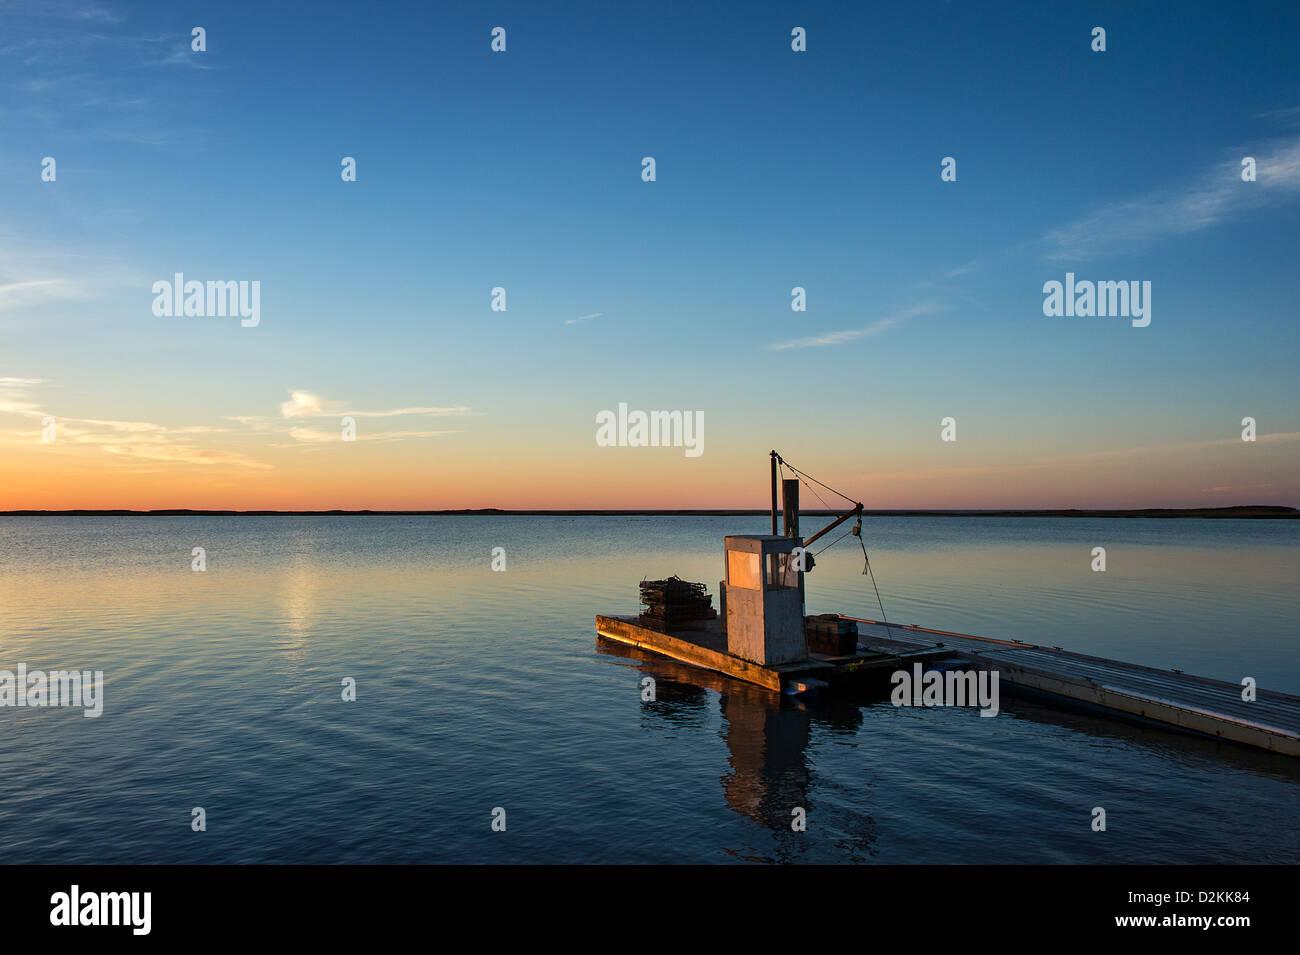 Floating dock at sunrise, Crackatuxet Cove, South Beach, Martha's Vineyard, Massachusetts, USA - Stock Image